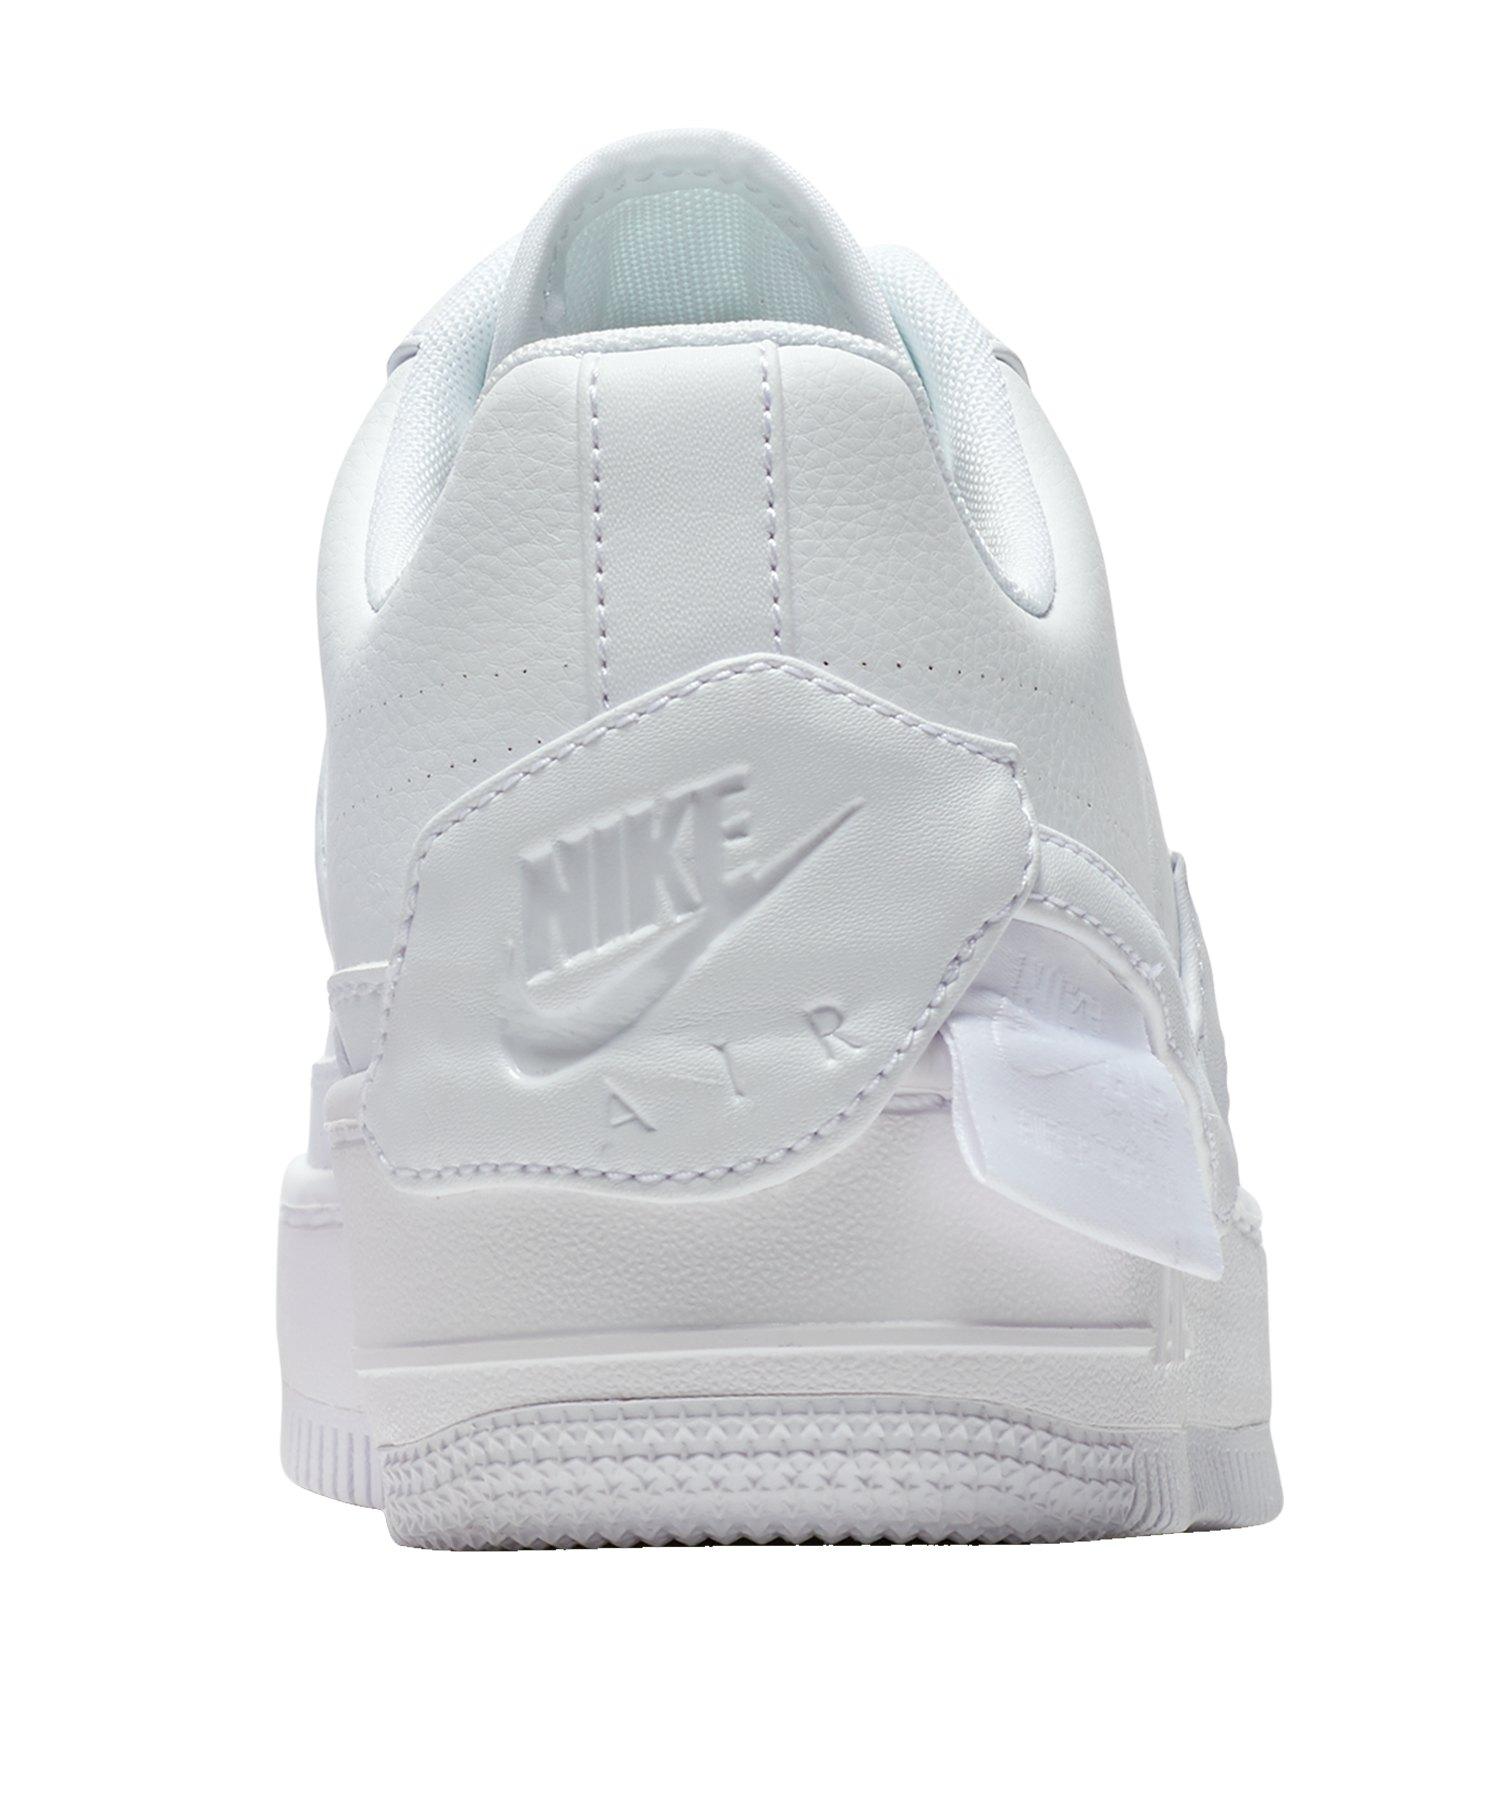 1 Force Xx Sneaker Damen Air Jester Nike F101 A54Rj3L